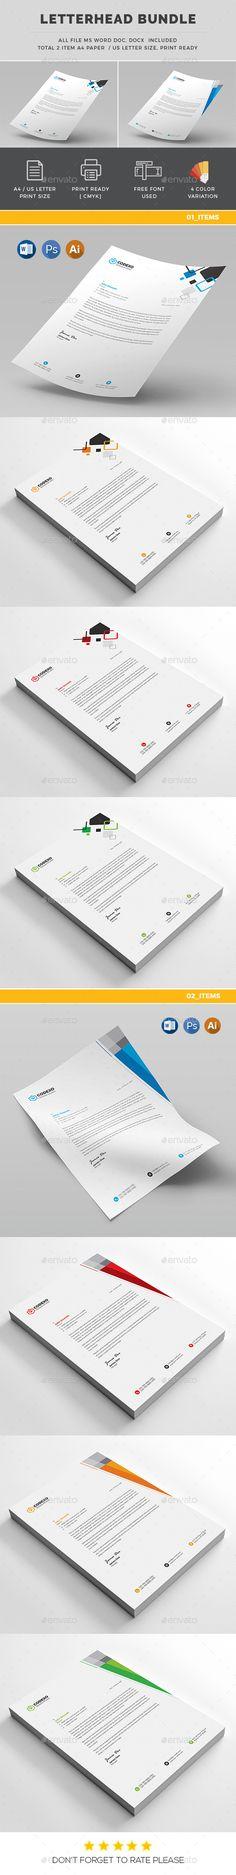 Letterhead Letterhead, Letterhead template and Stationery printing - letterhead format word